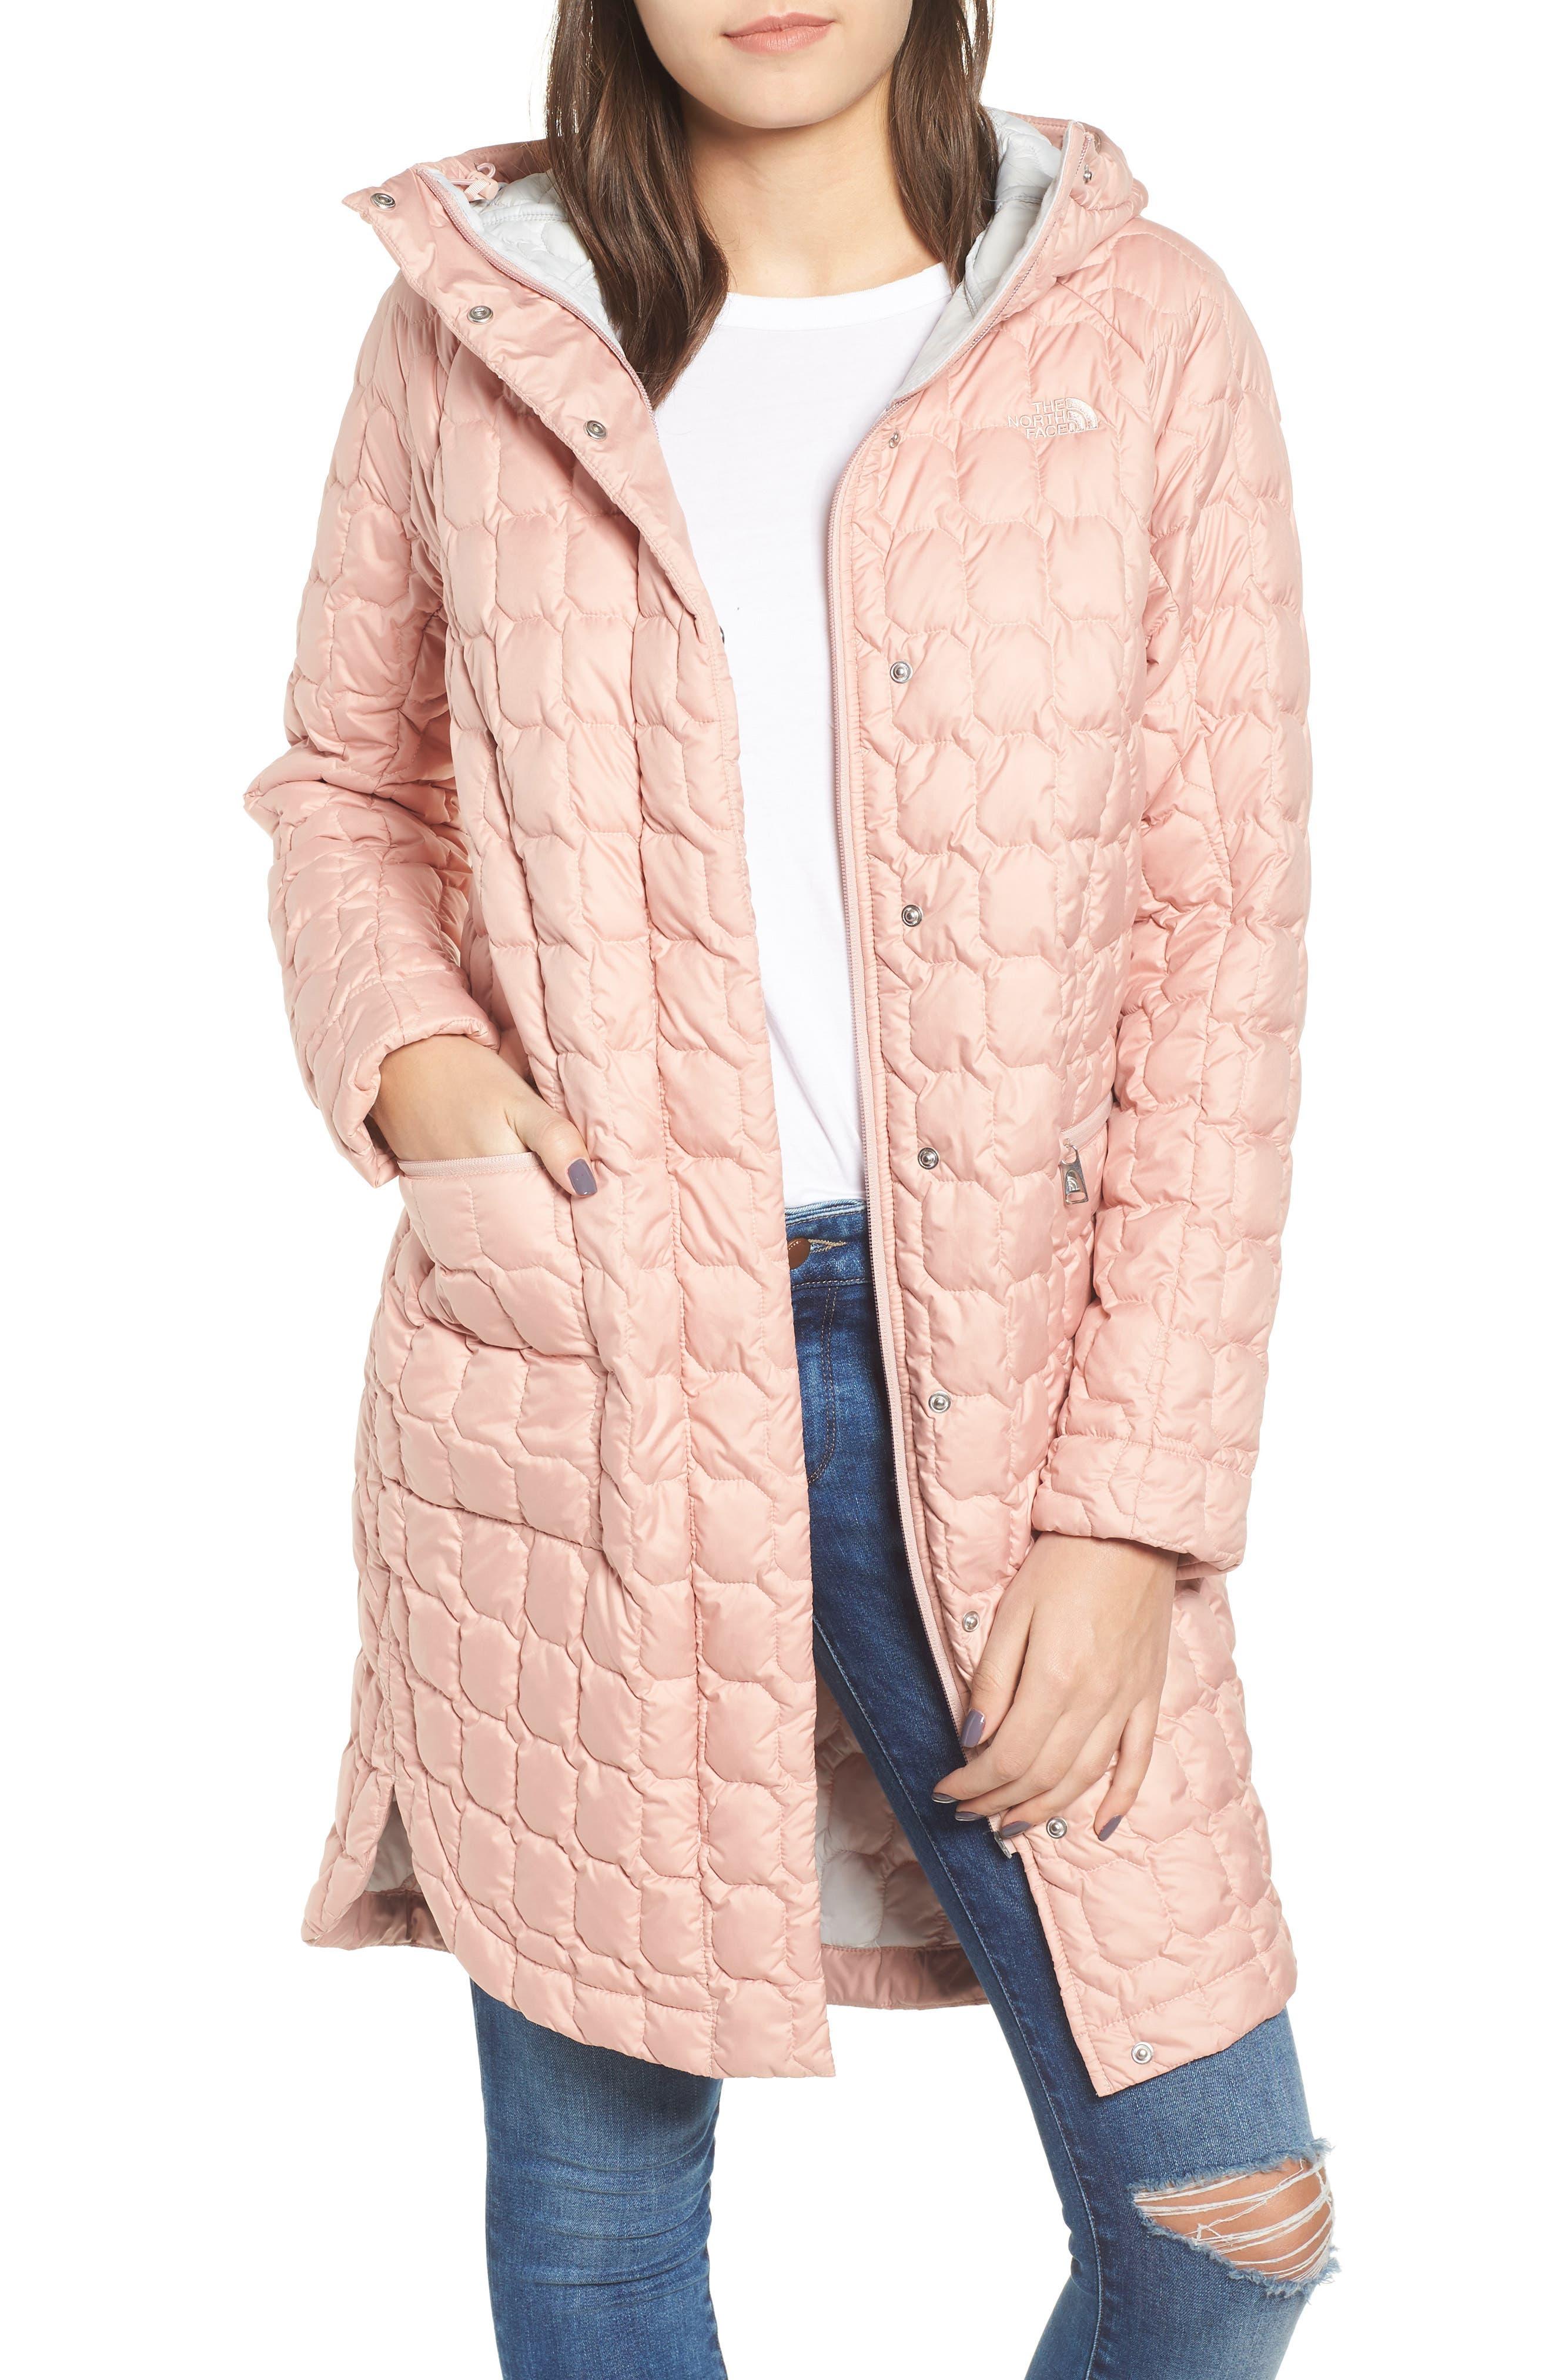 Women's Jackets Coats Pink amp; Nordstrom qrPcwq4n